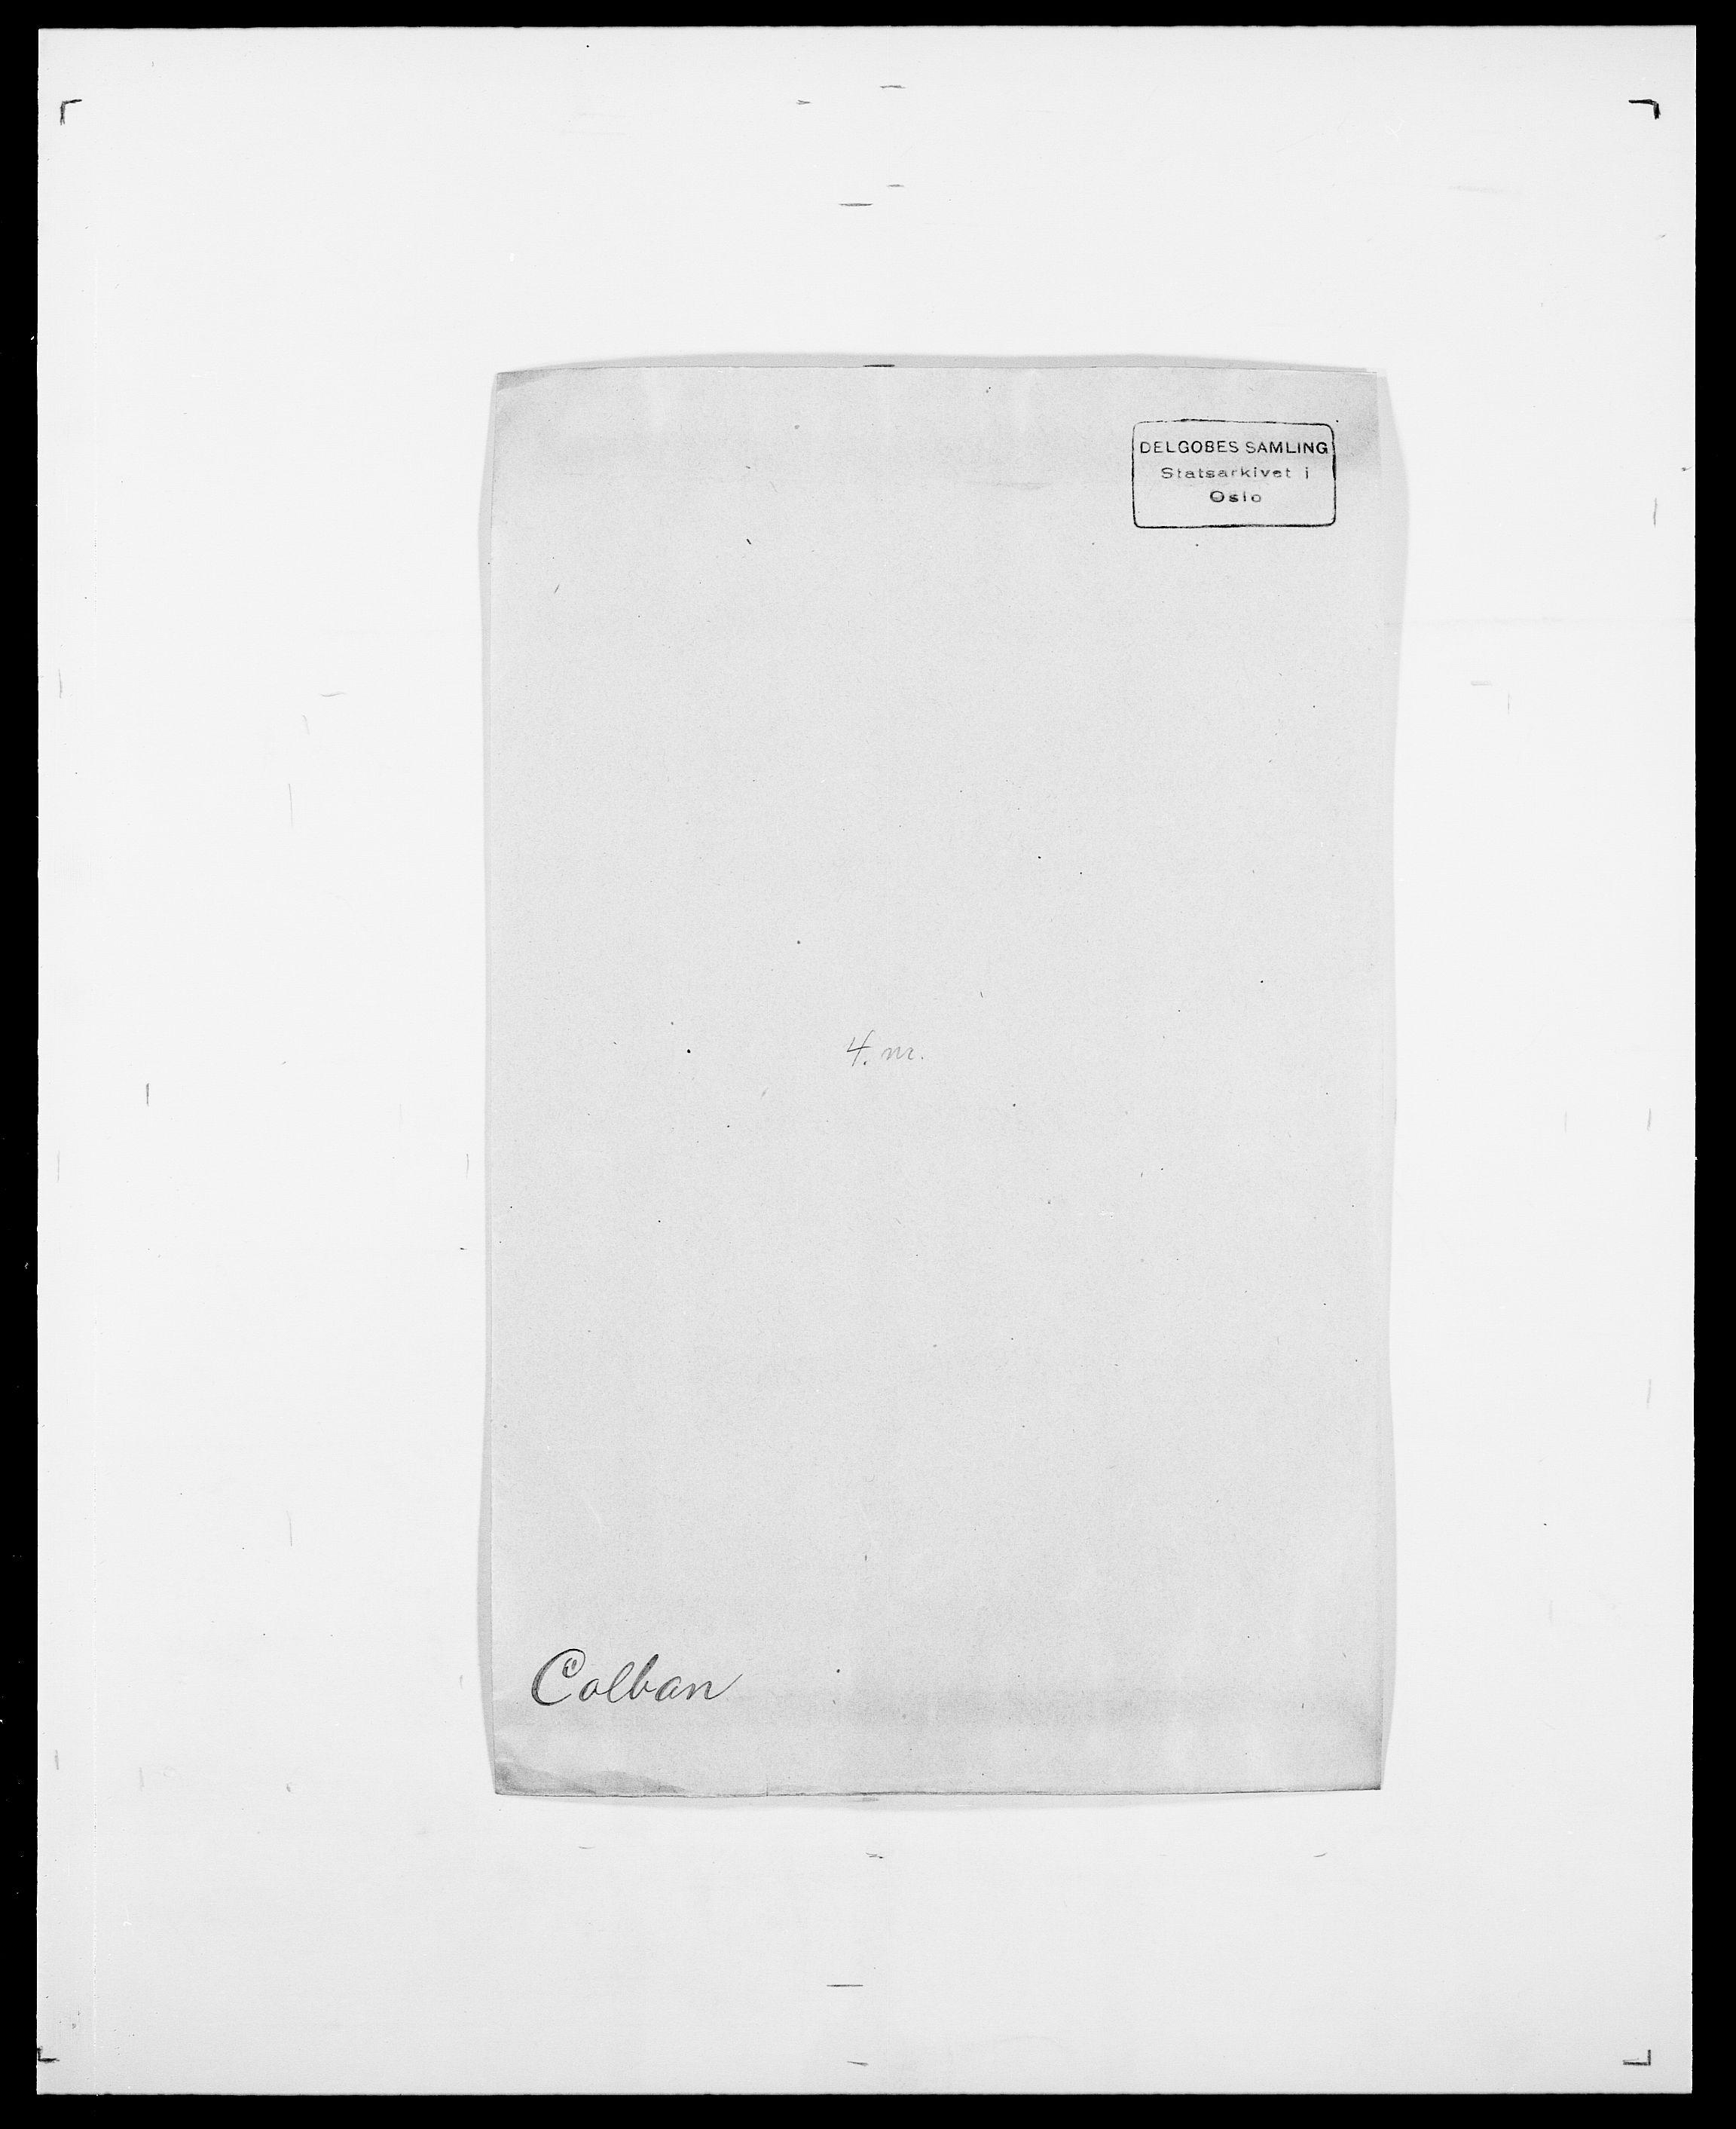 SAO, Delgobe, Charles Antoine - samling, D/Da/L0008: Capjon - Dagenbolt, s. 397